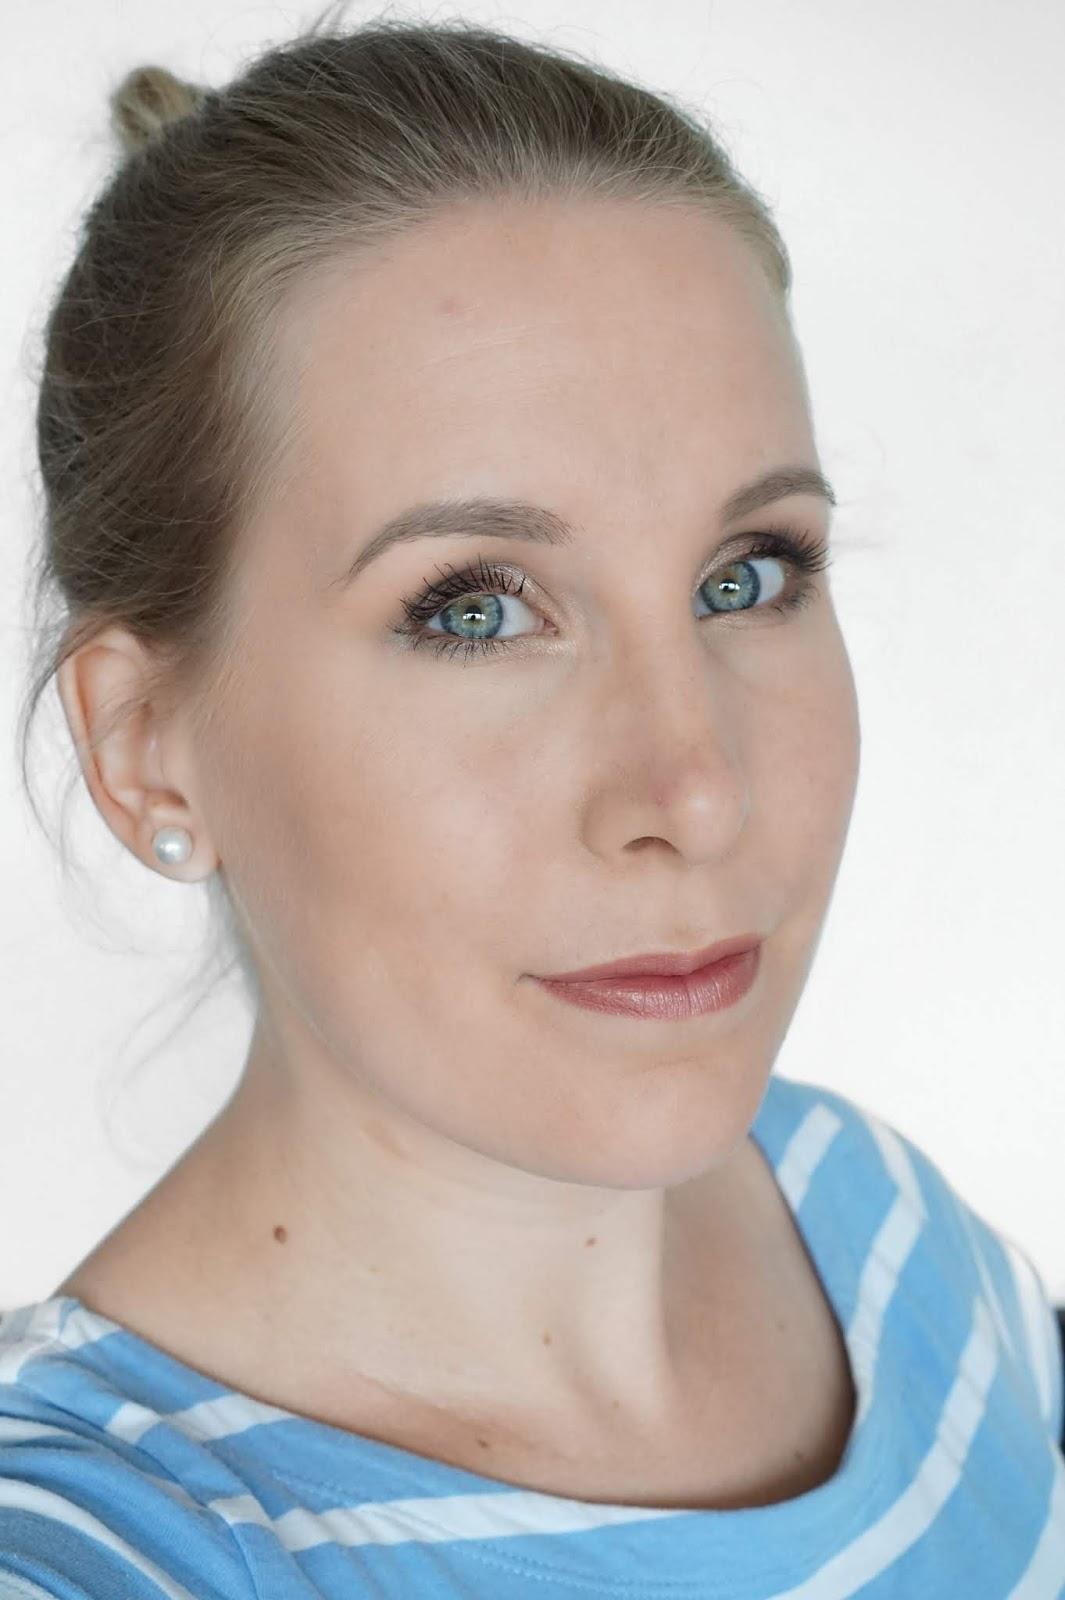 Glo_Skin_Beauty_Full_Face_of_Makeup_Selfie